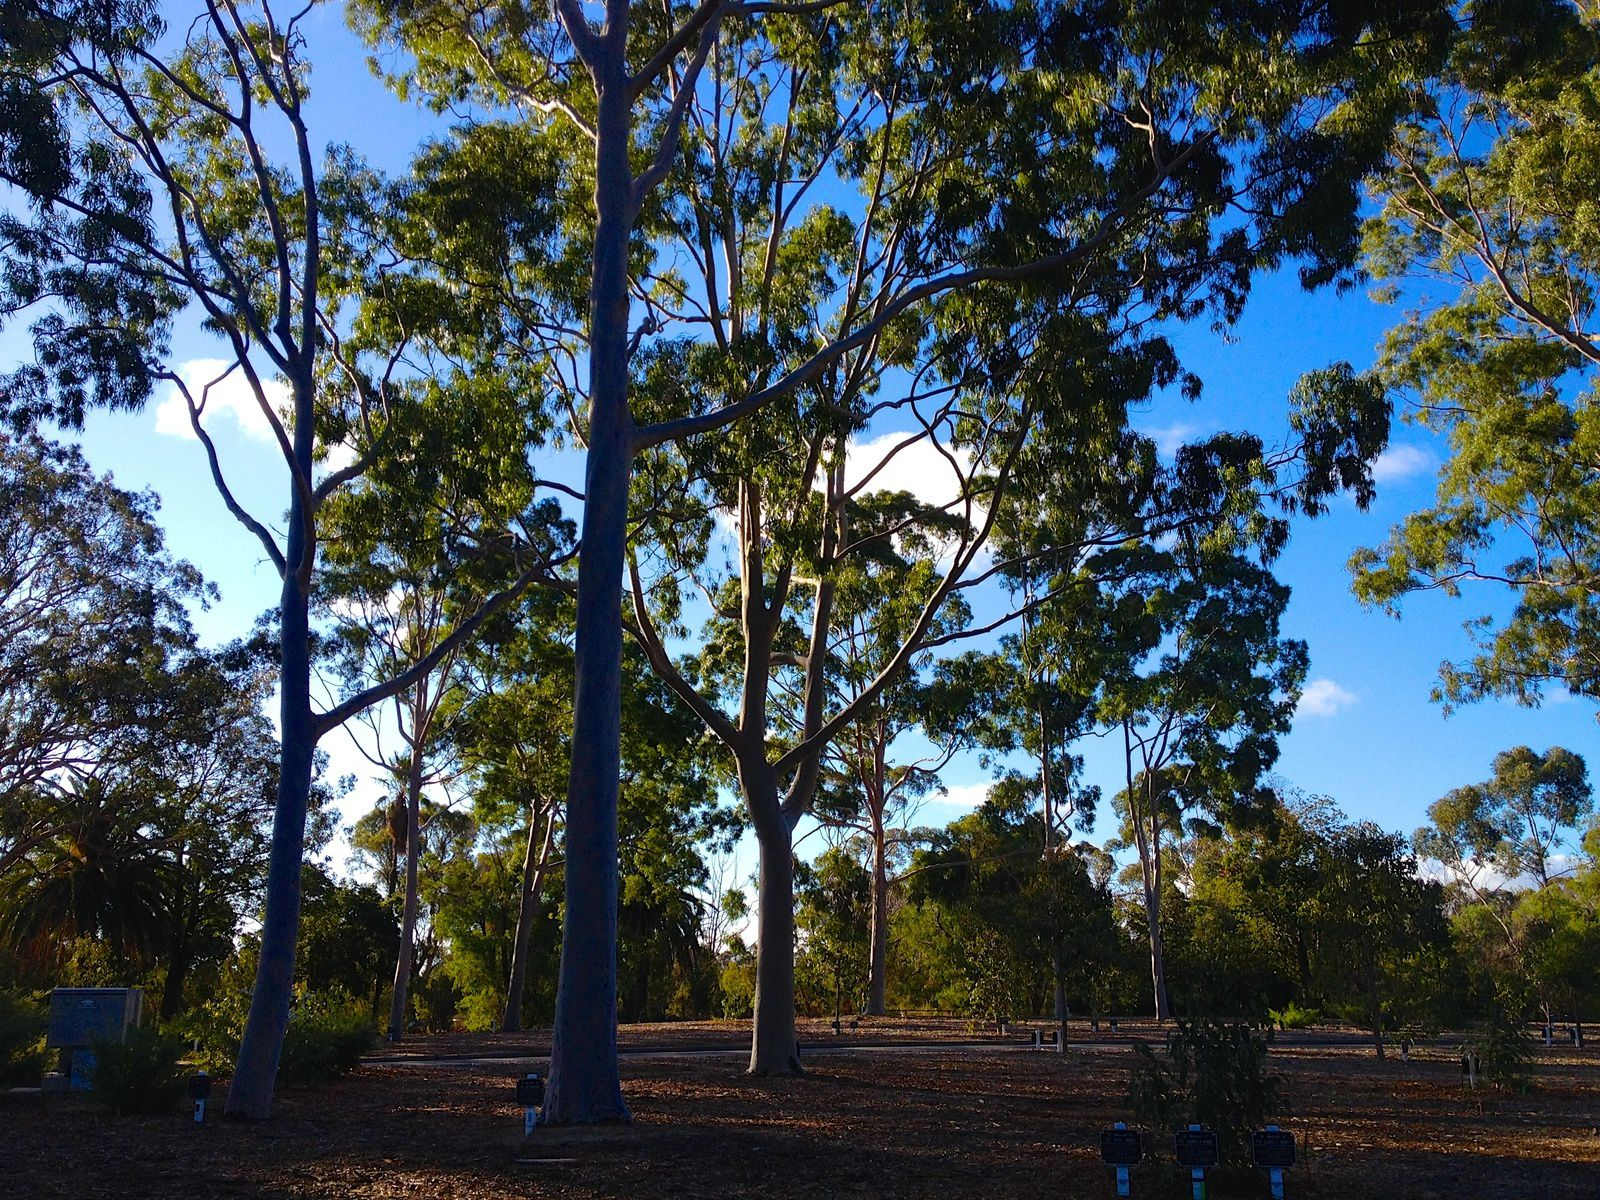 King's Park, Perth